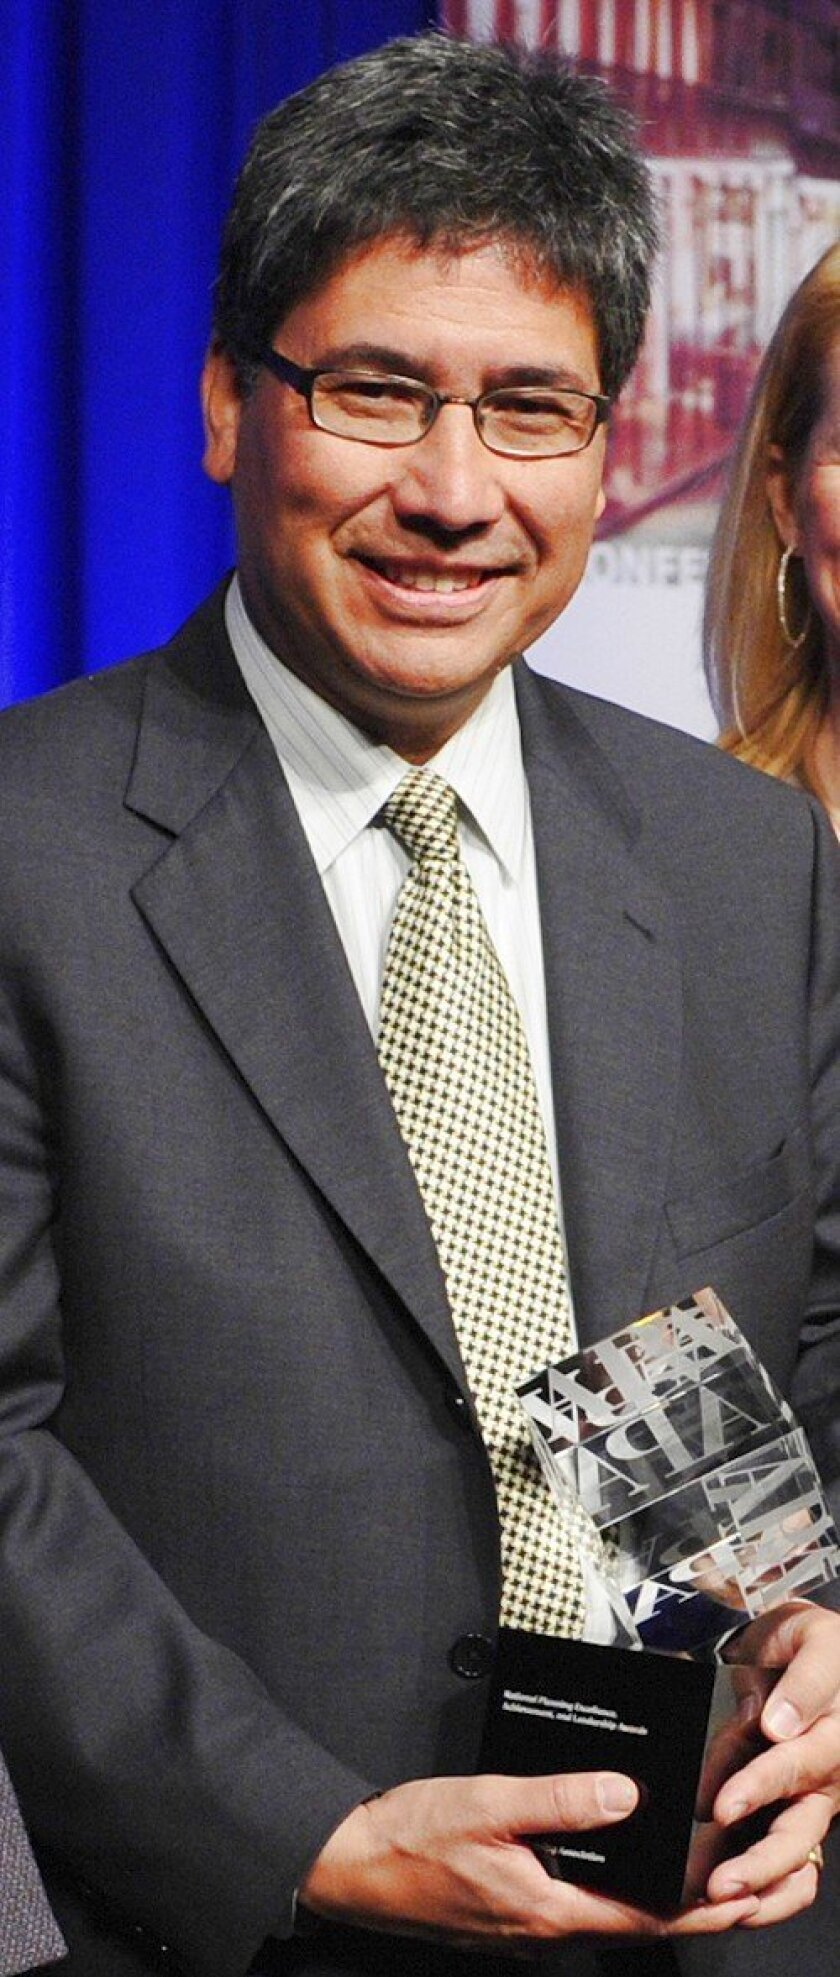 Former San Diego Planning Director Bill Anderson